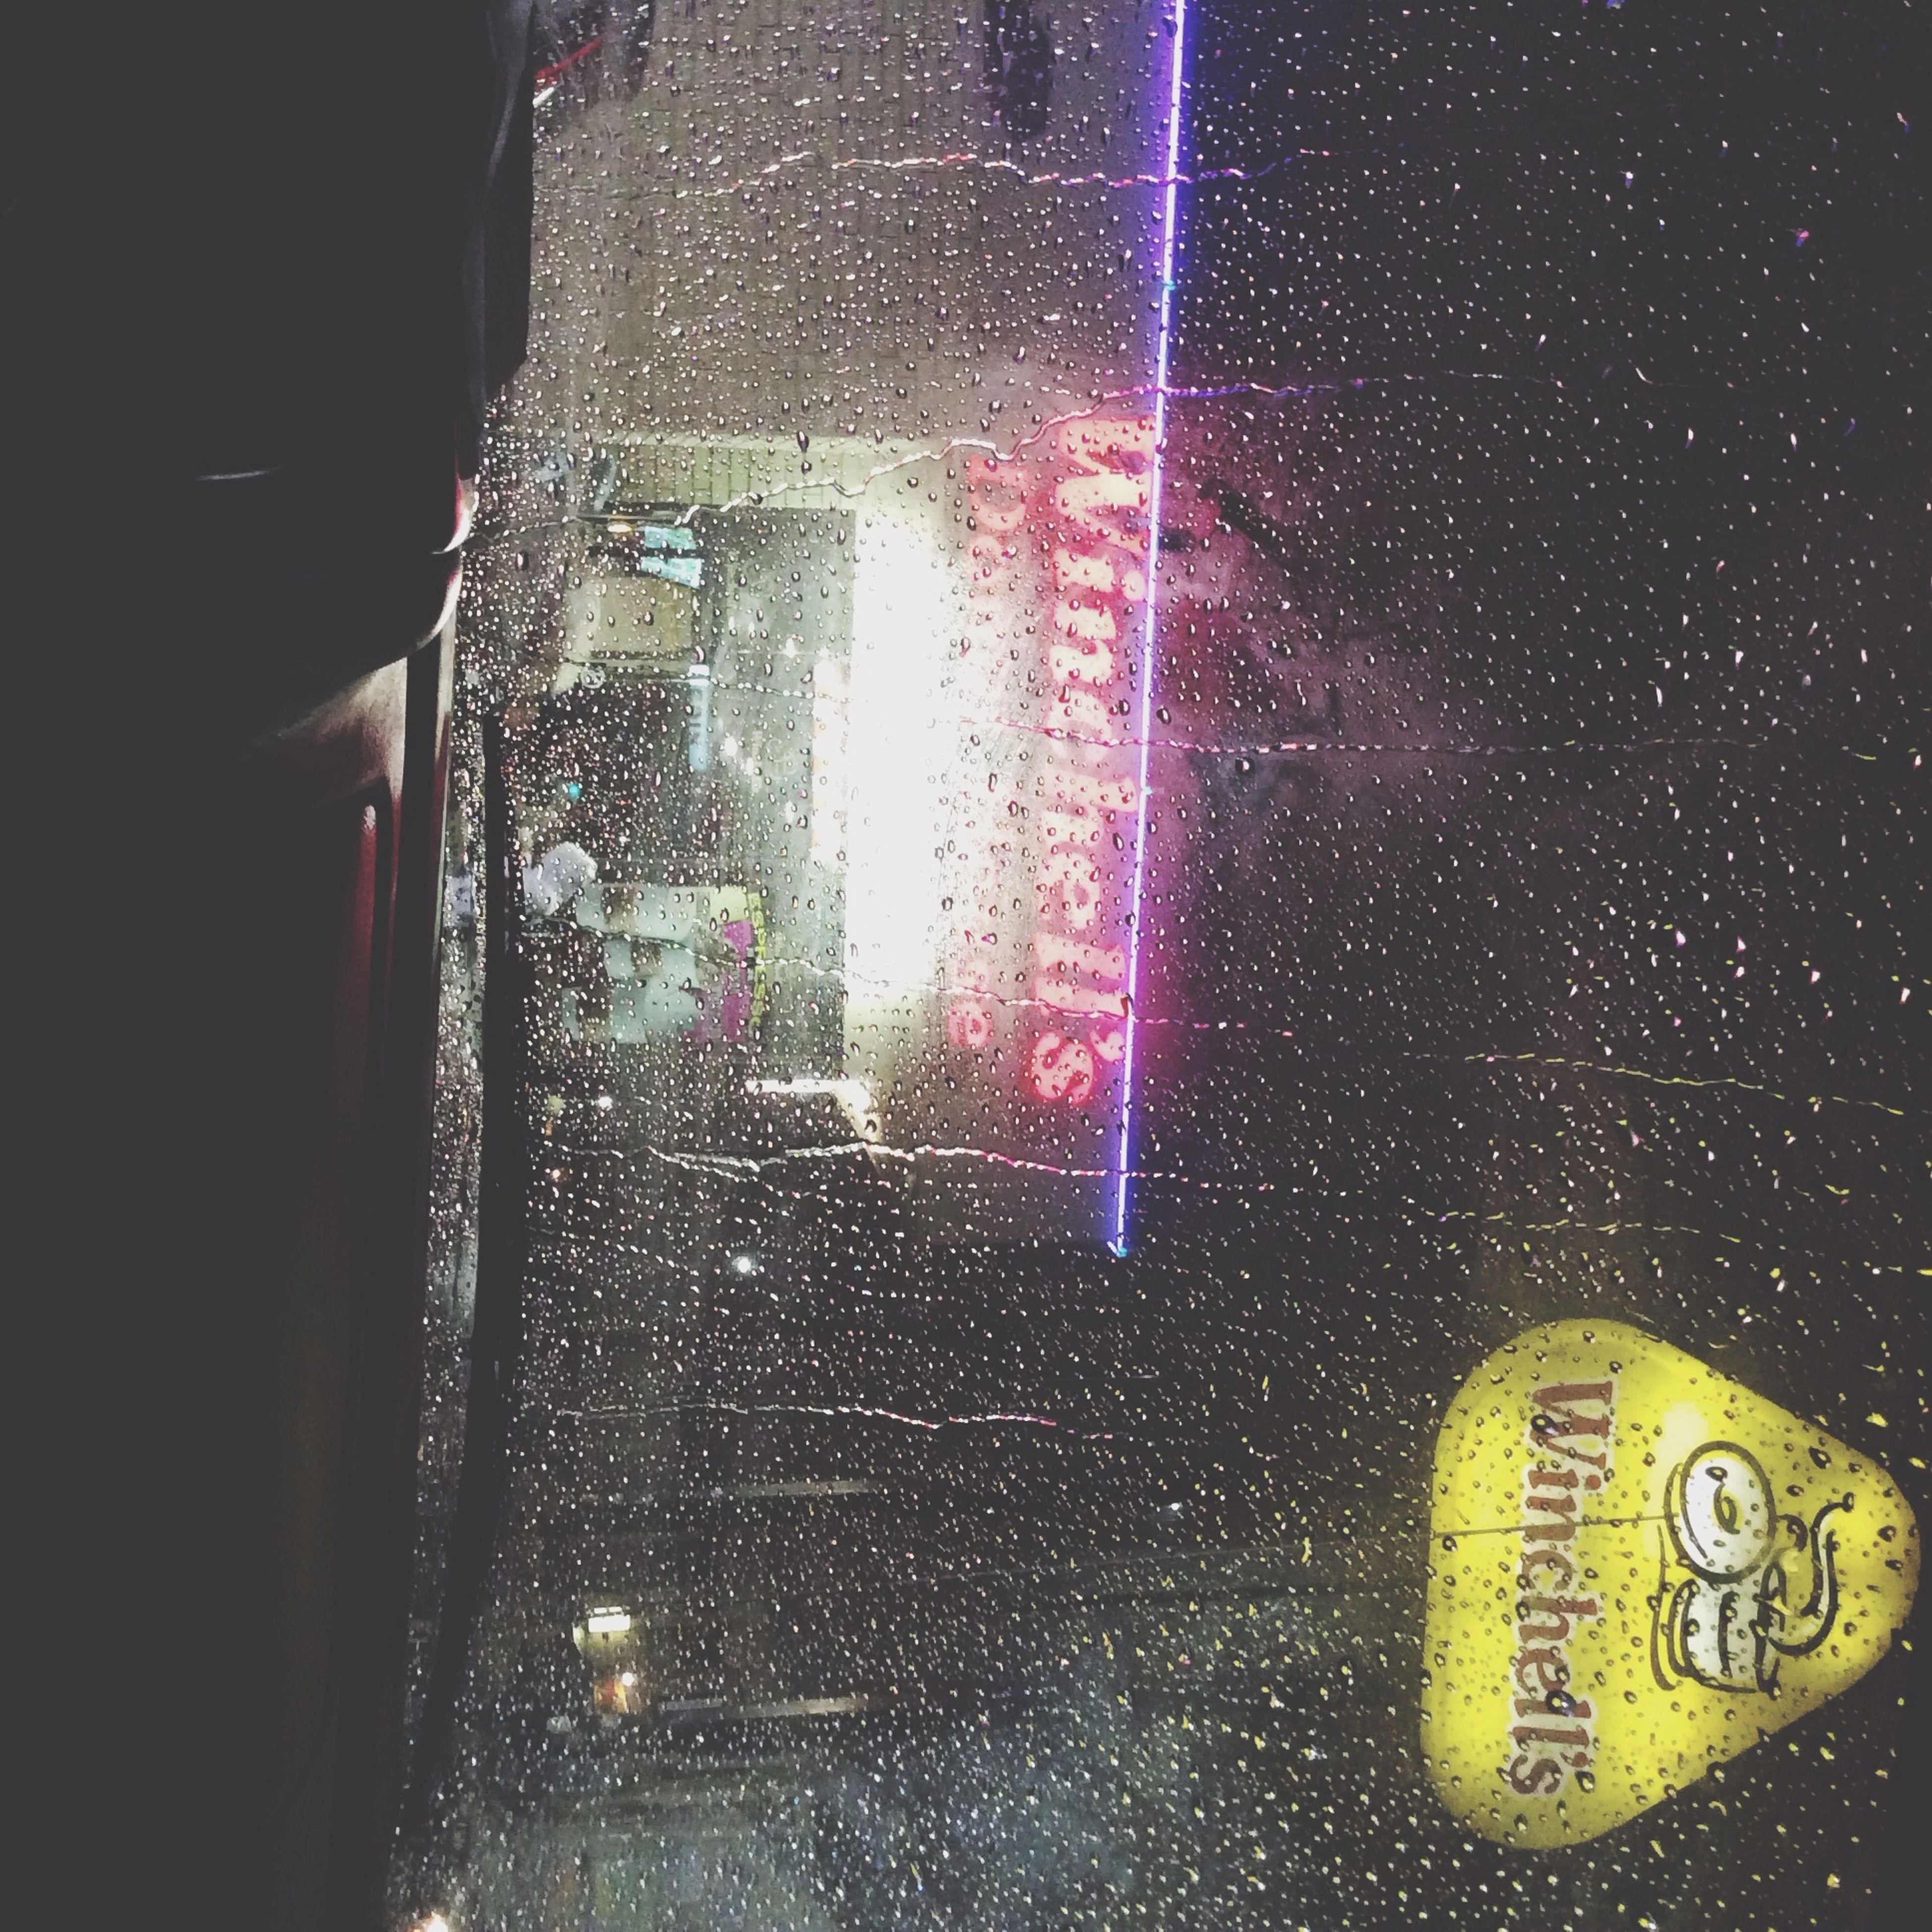 glass - material, indoors, transparent, illuminated, night, window, close-up, wet, drop, transportation, windshield, text, communication, vehicle interior, car, rain, western script, focus on foreground, car interior, glass